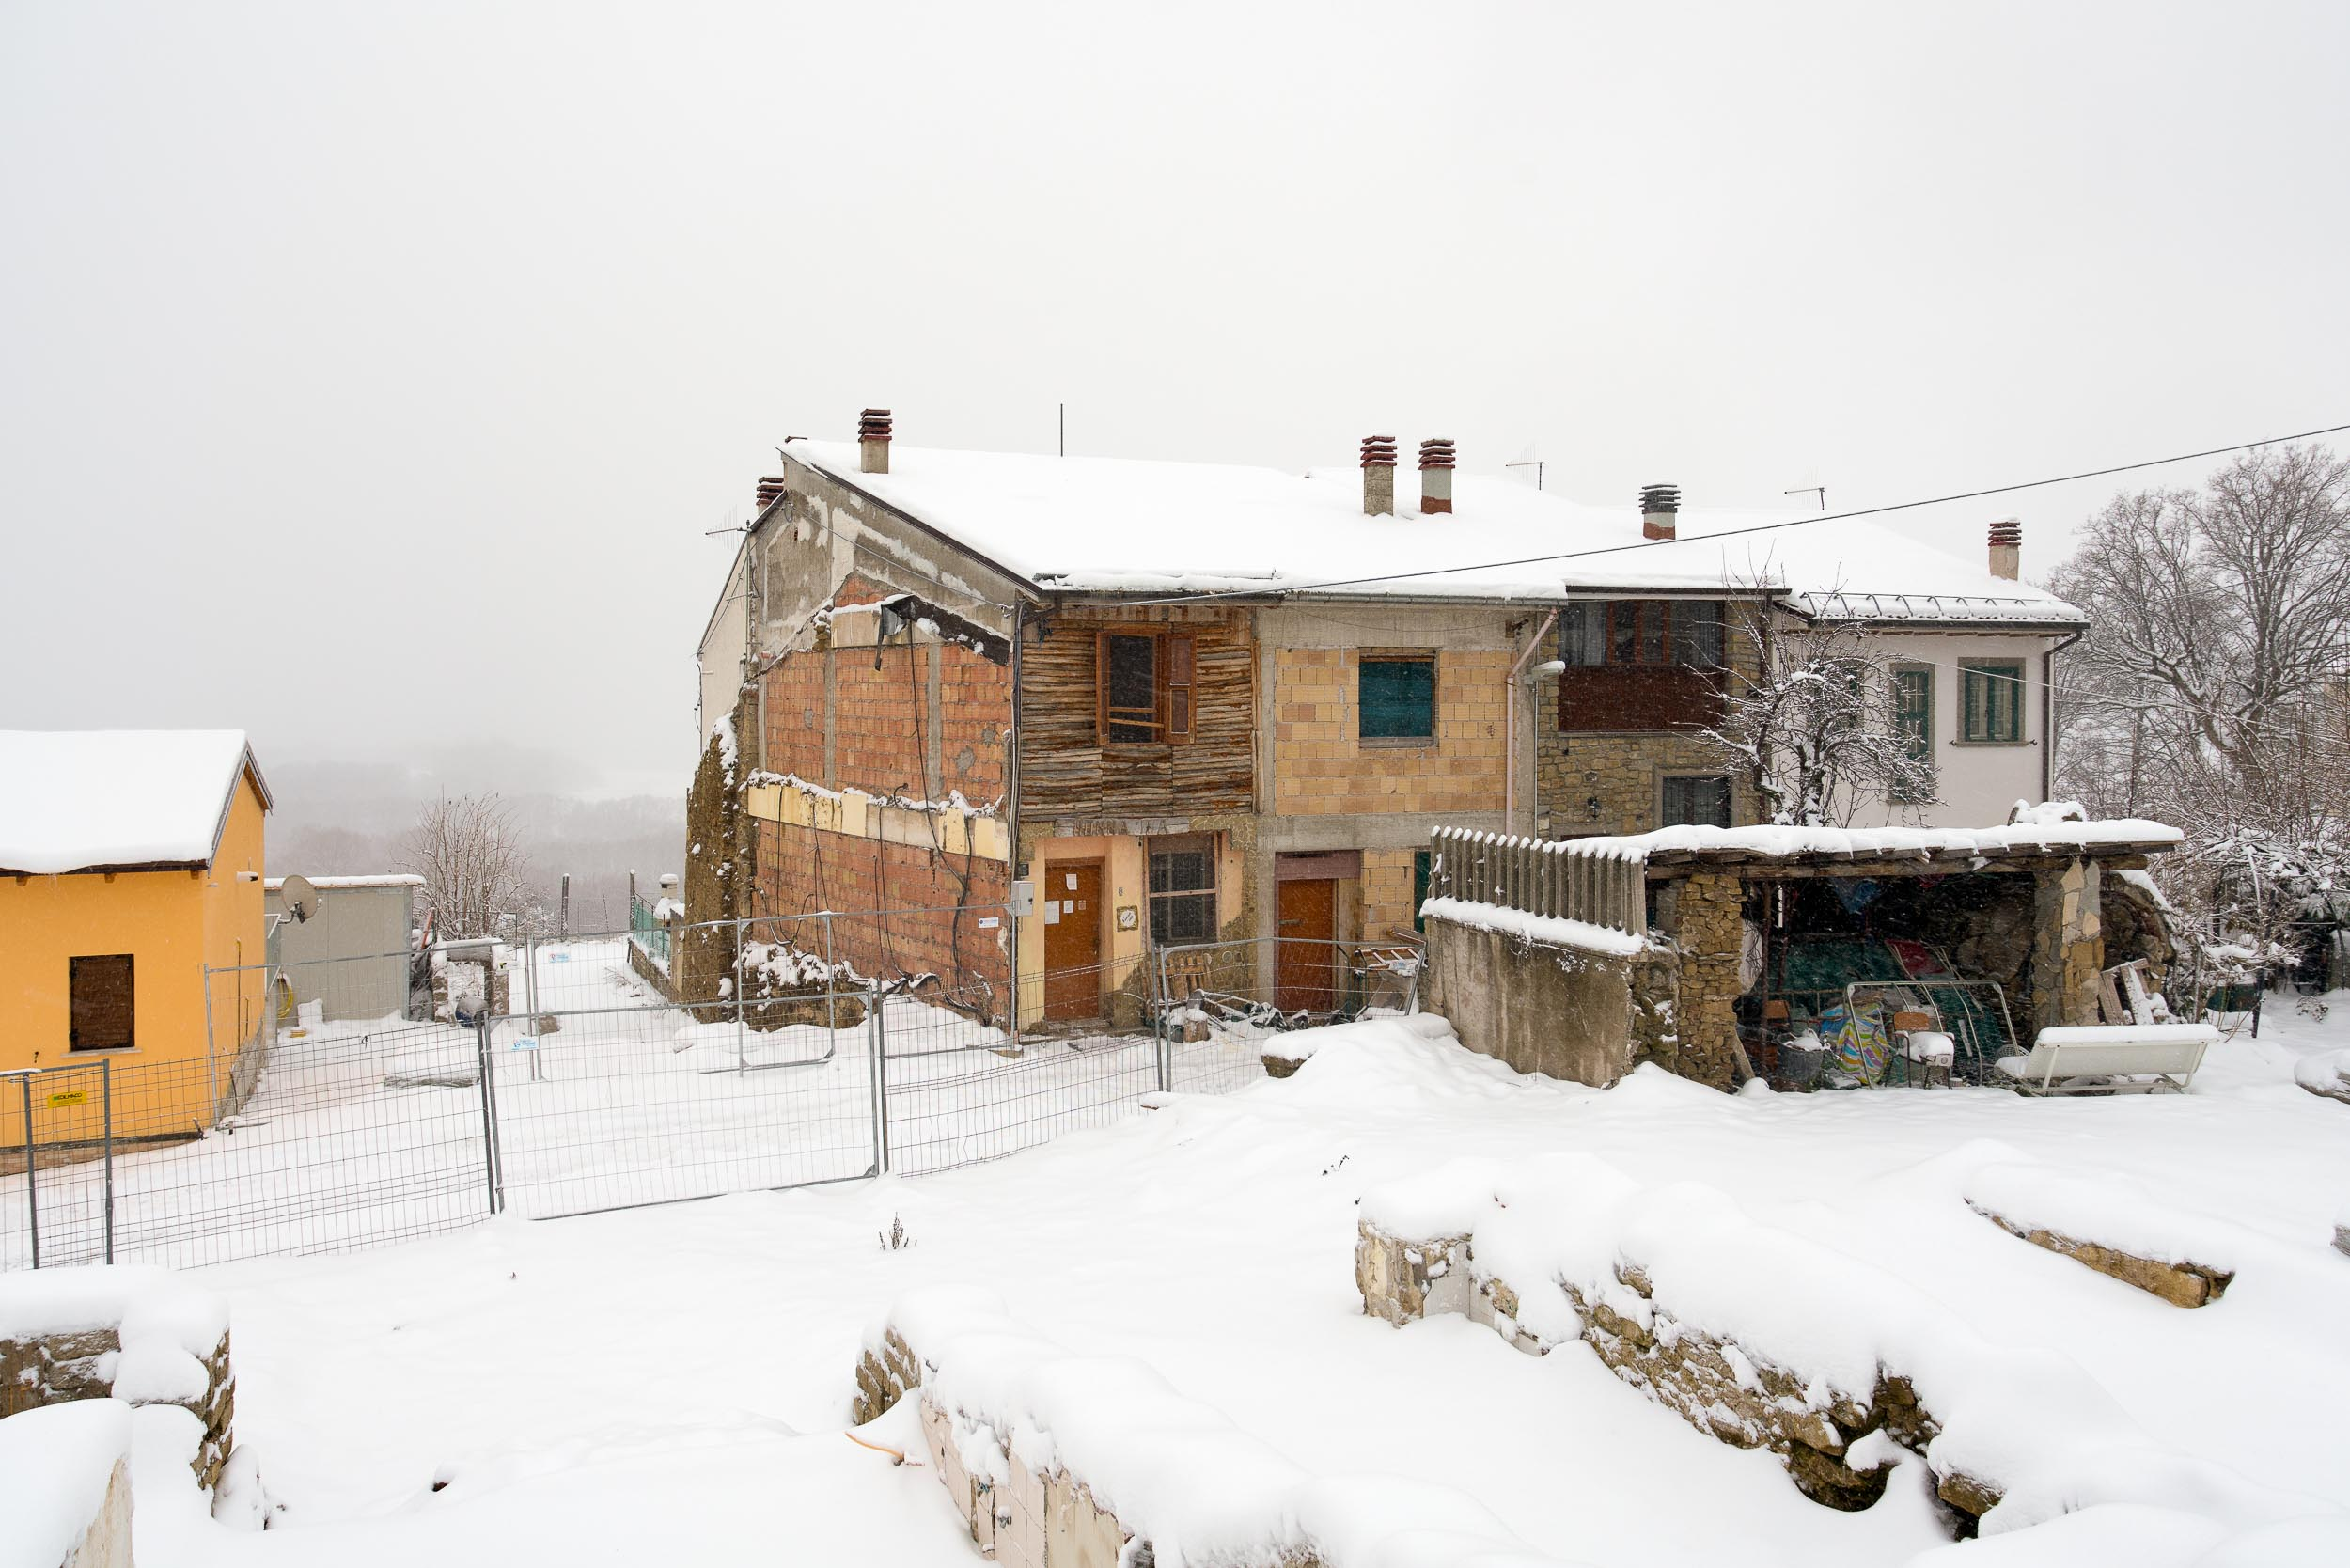 006-Campotosto_GAB3225M-Gabriele Lungarella.jpg